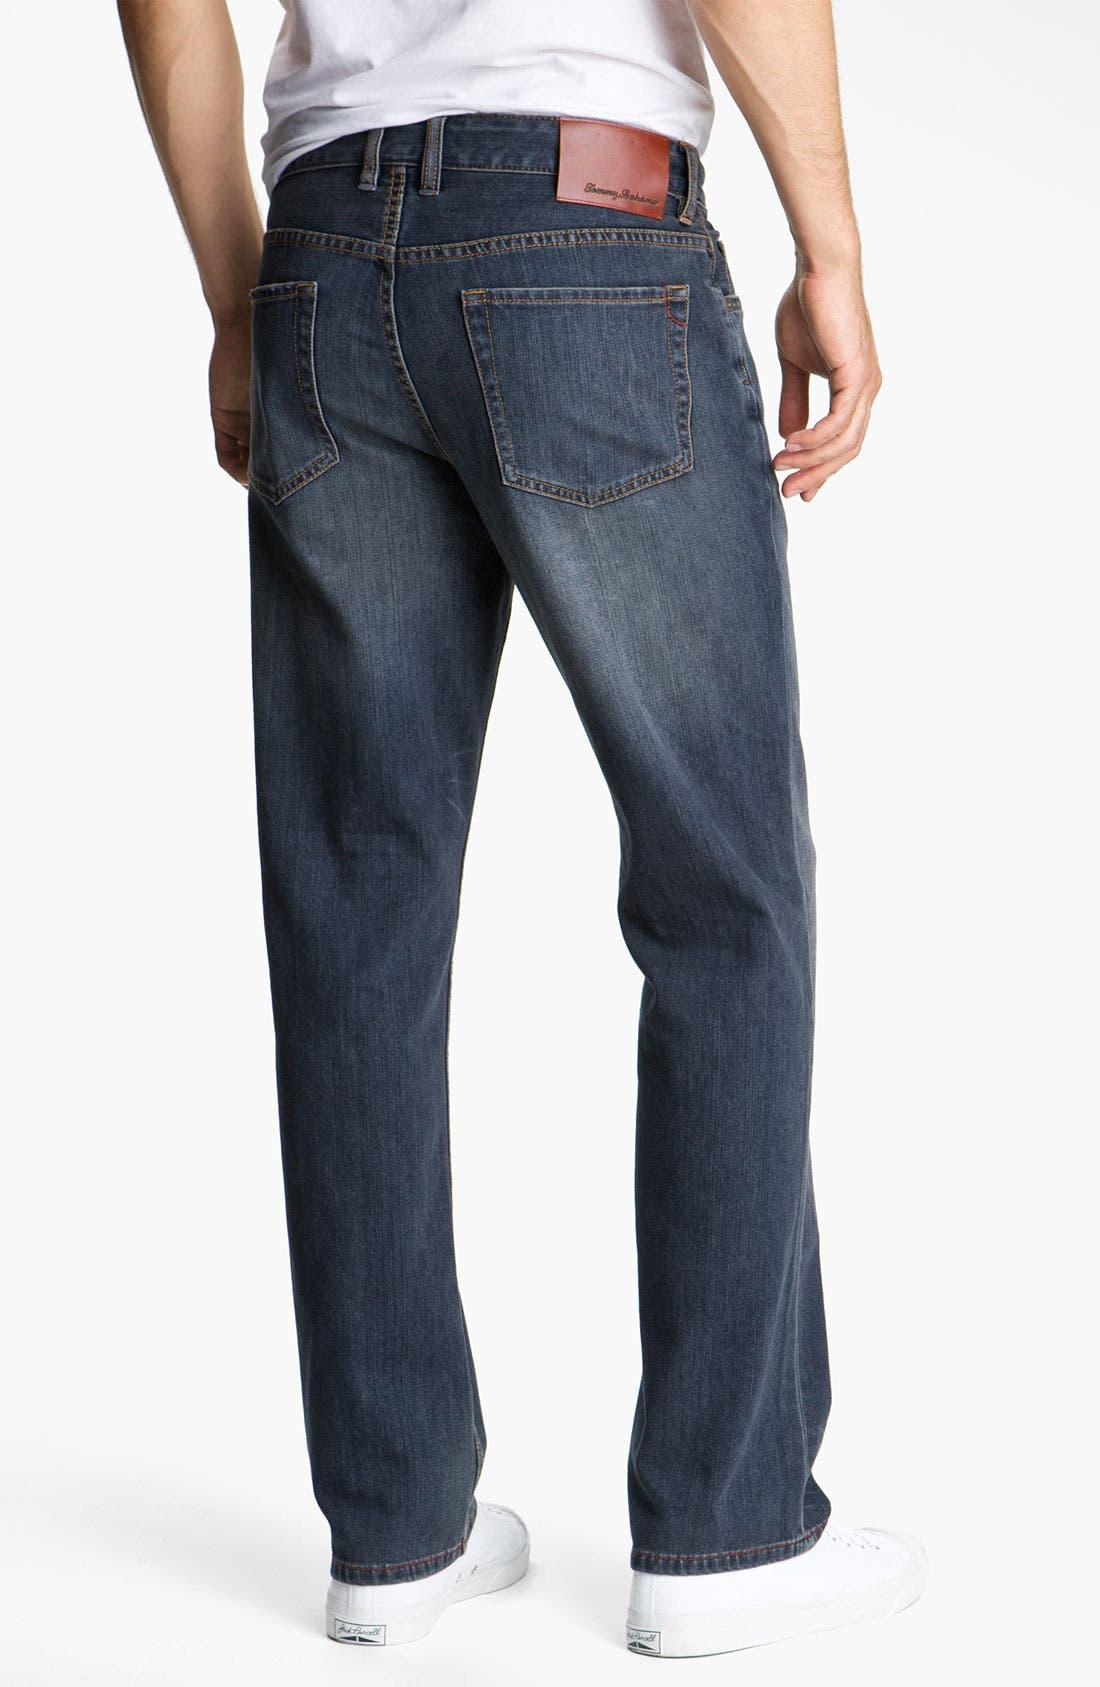 Alternate Image 1 Selected - Tommy Bahama Denim 'Original Cooper' Jeans (Dark Storm)